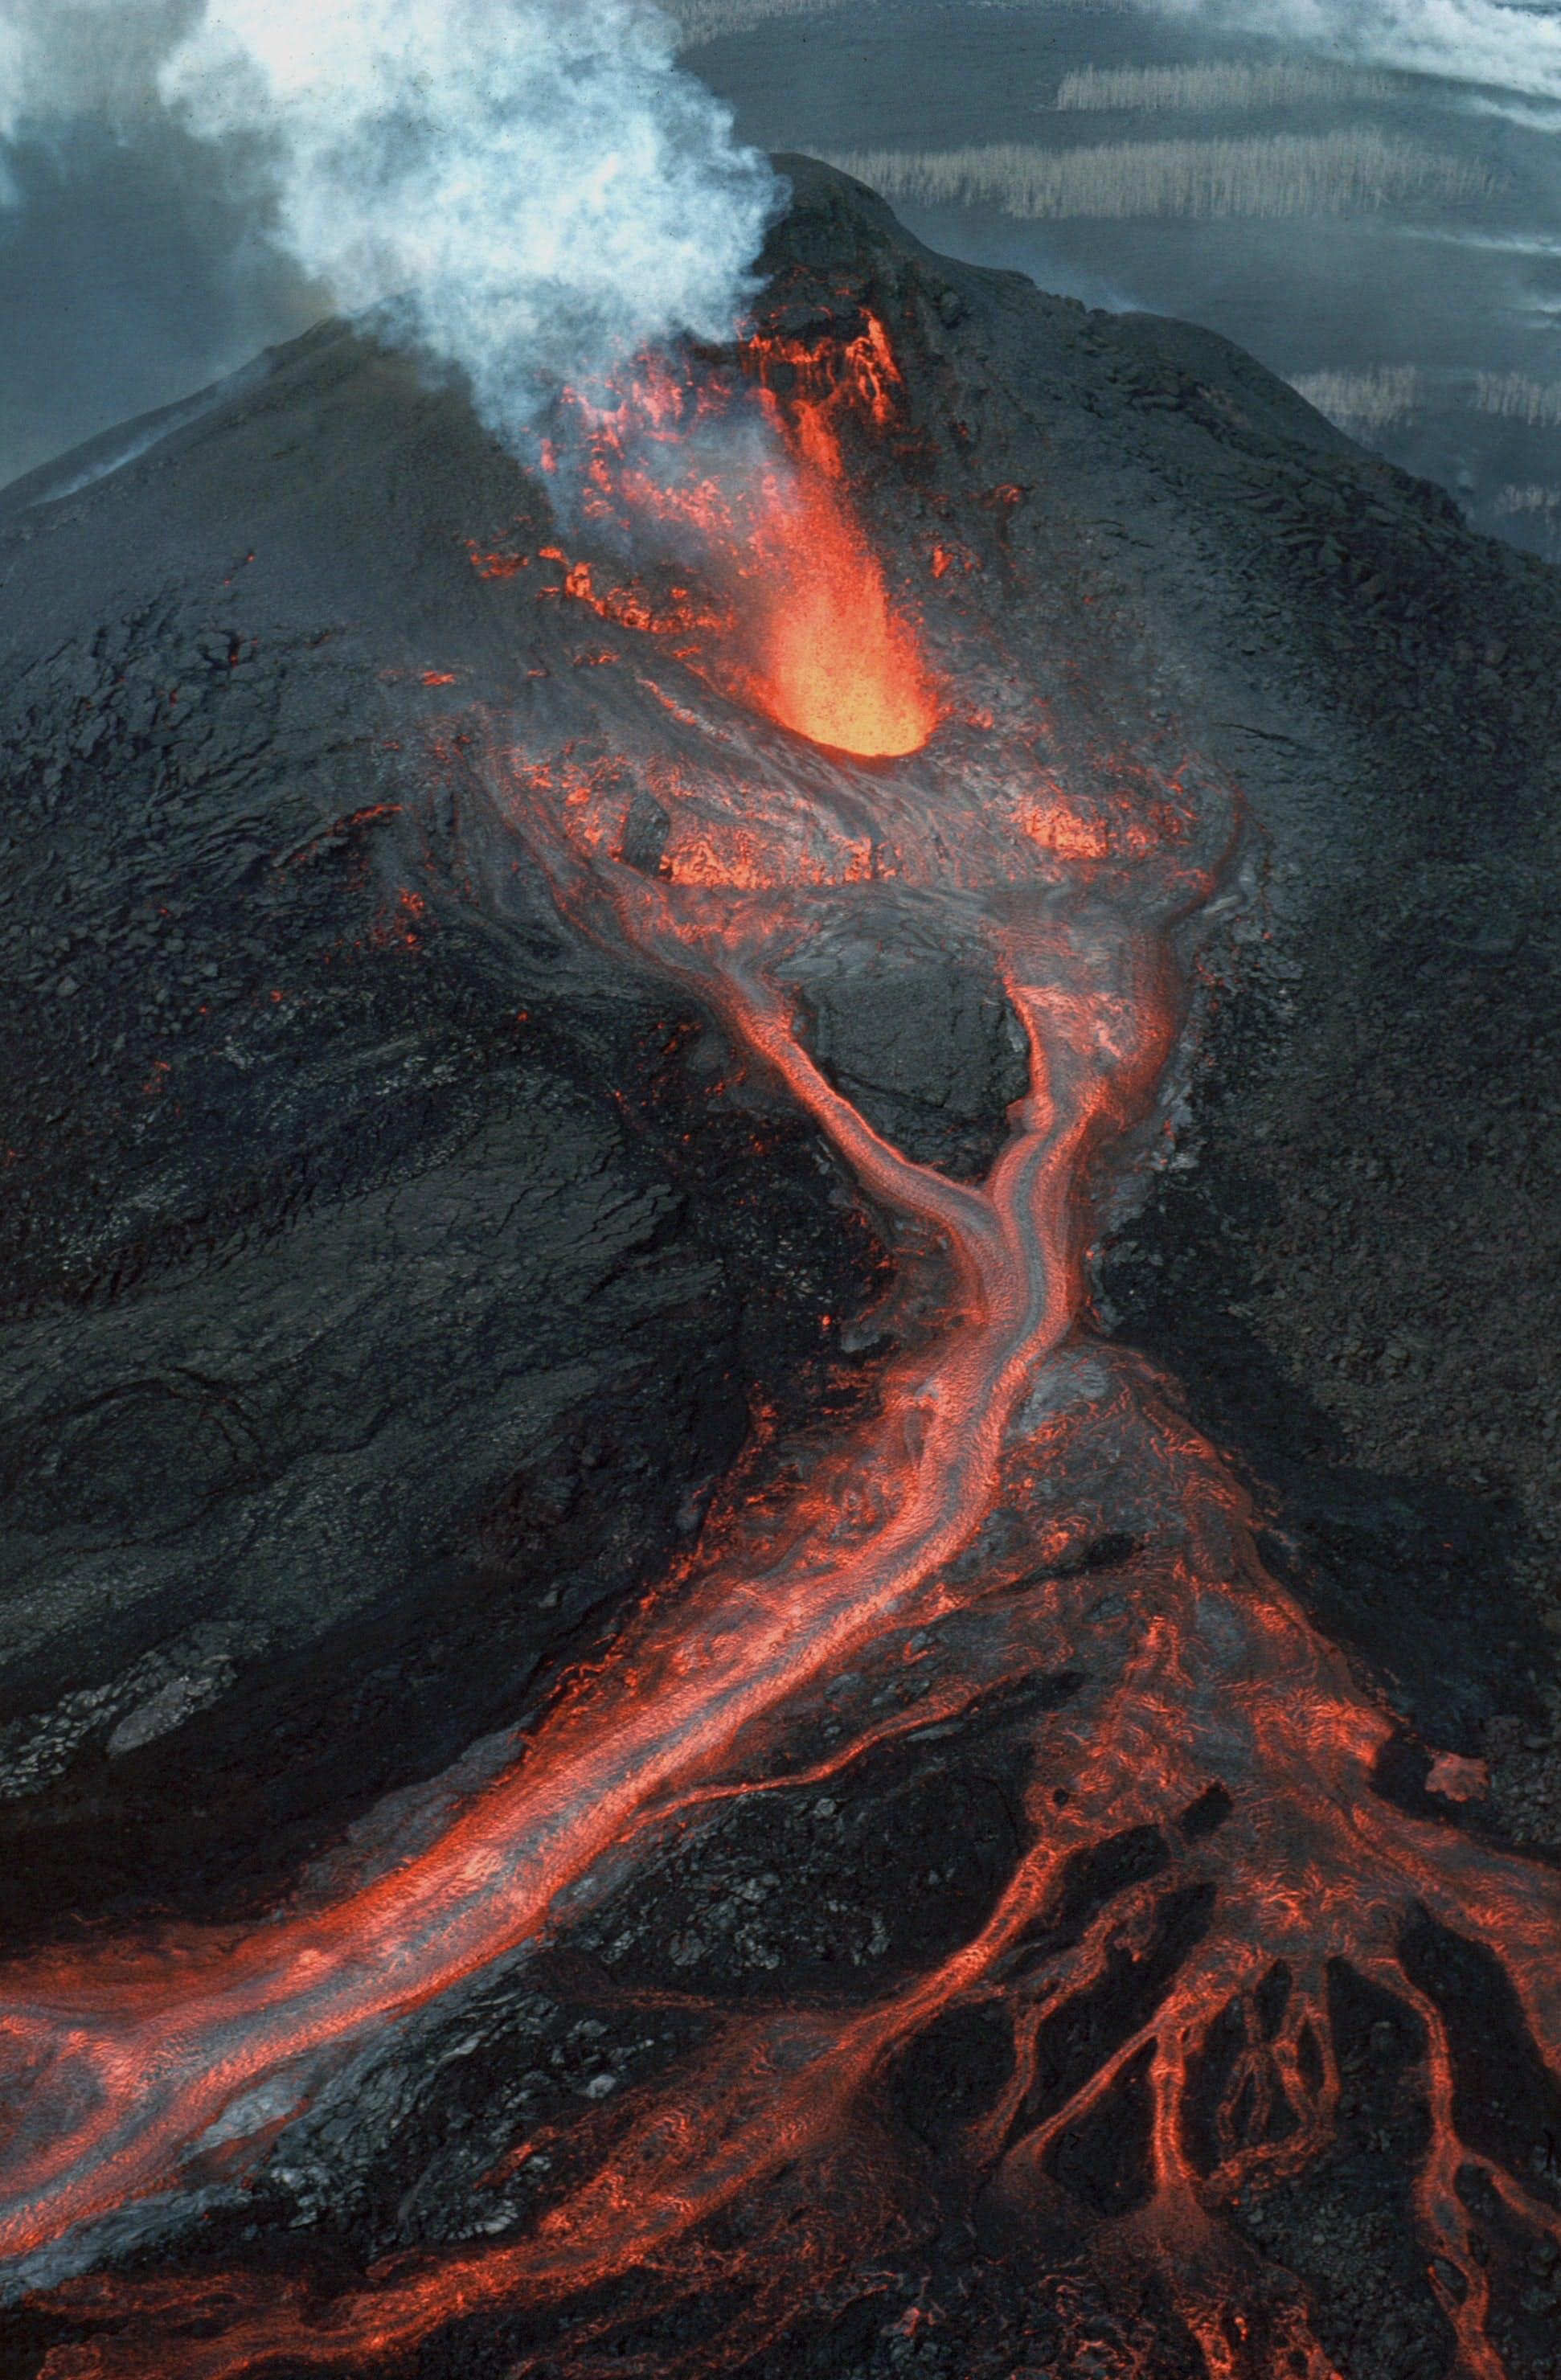 Foto di USGS (United States Geological Survey), fonte Unsplash